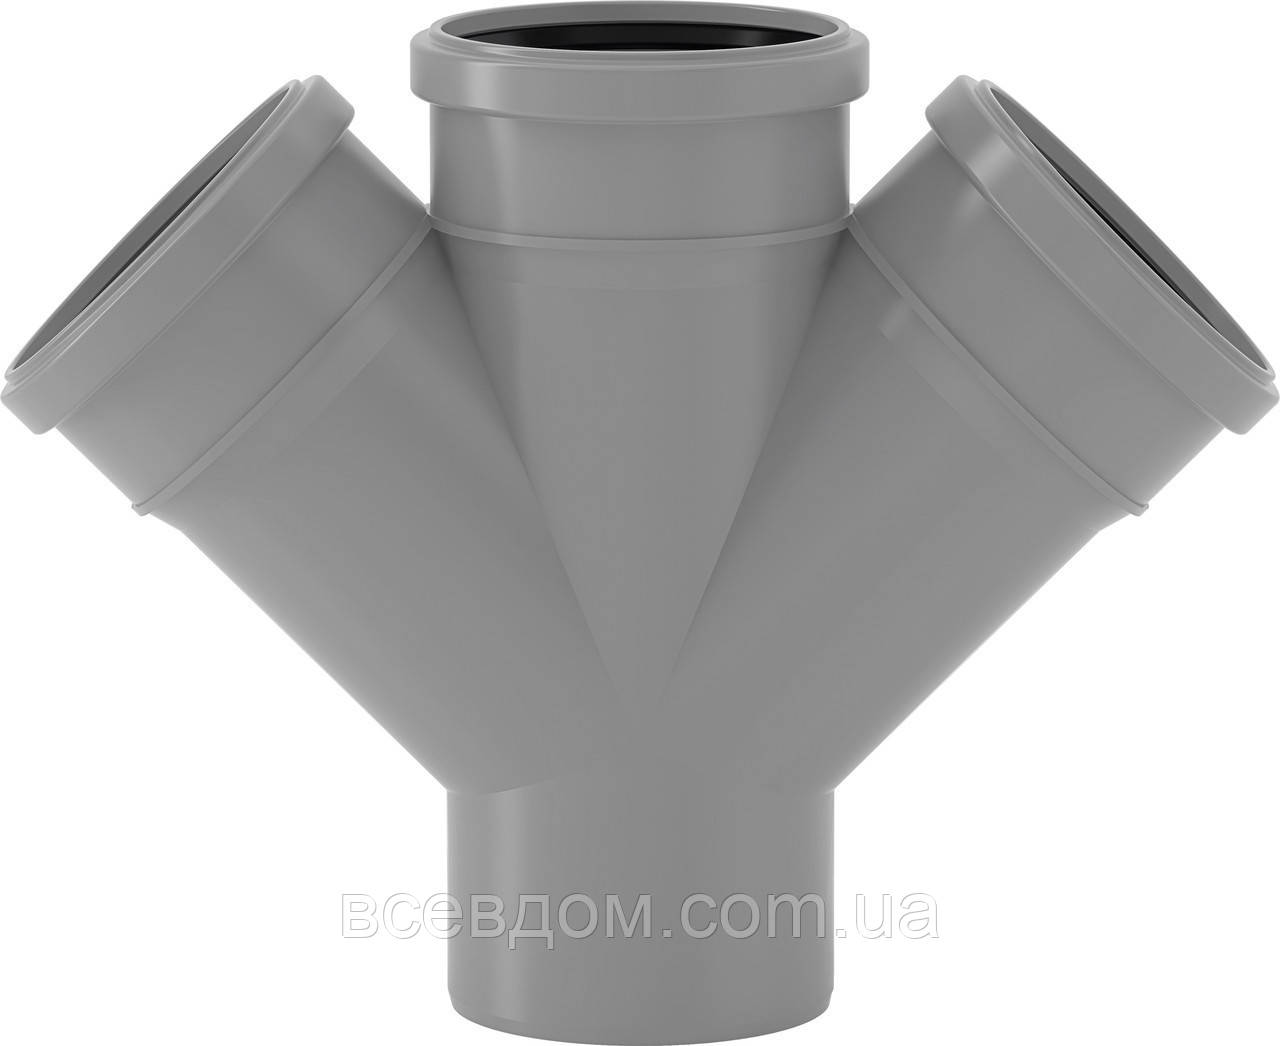 HDTA крестовина Valsir внутренней канализации 50/50/50х67°